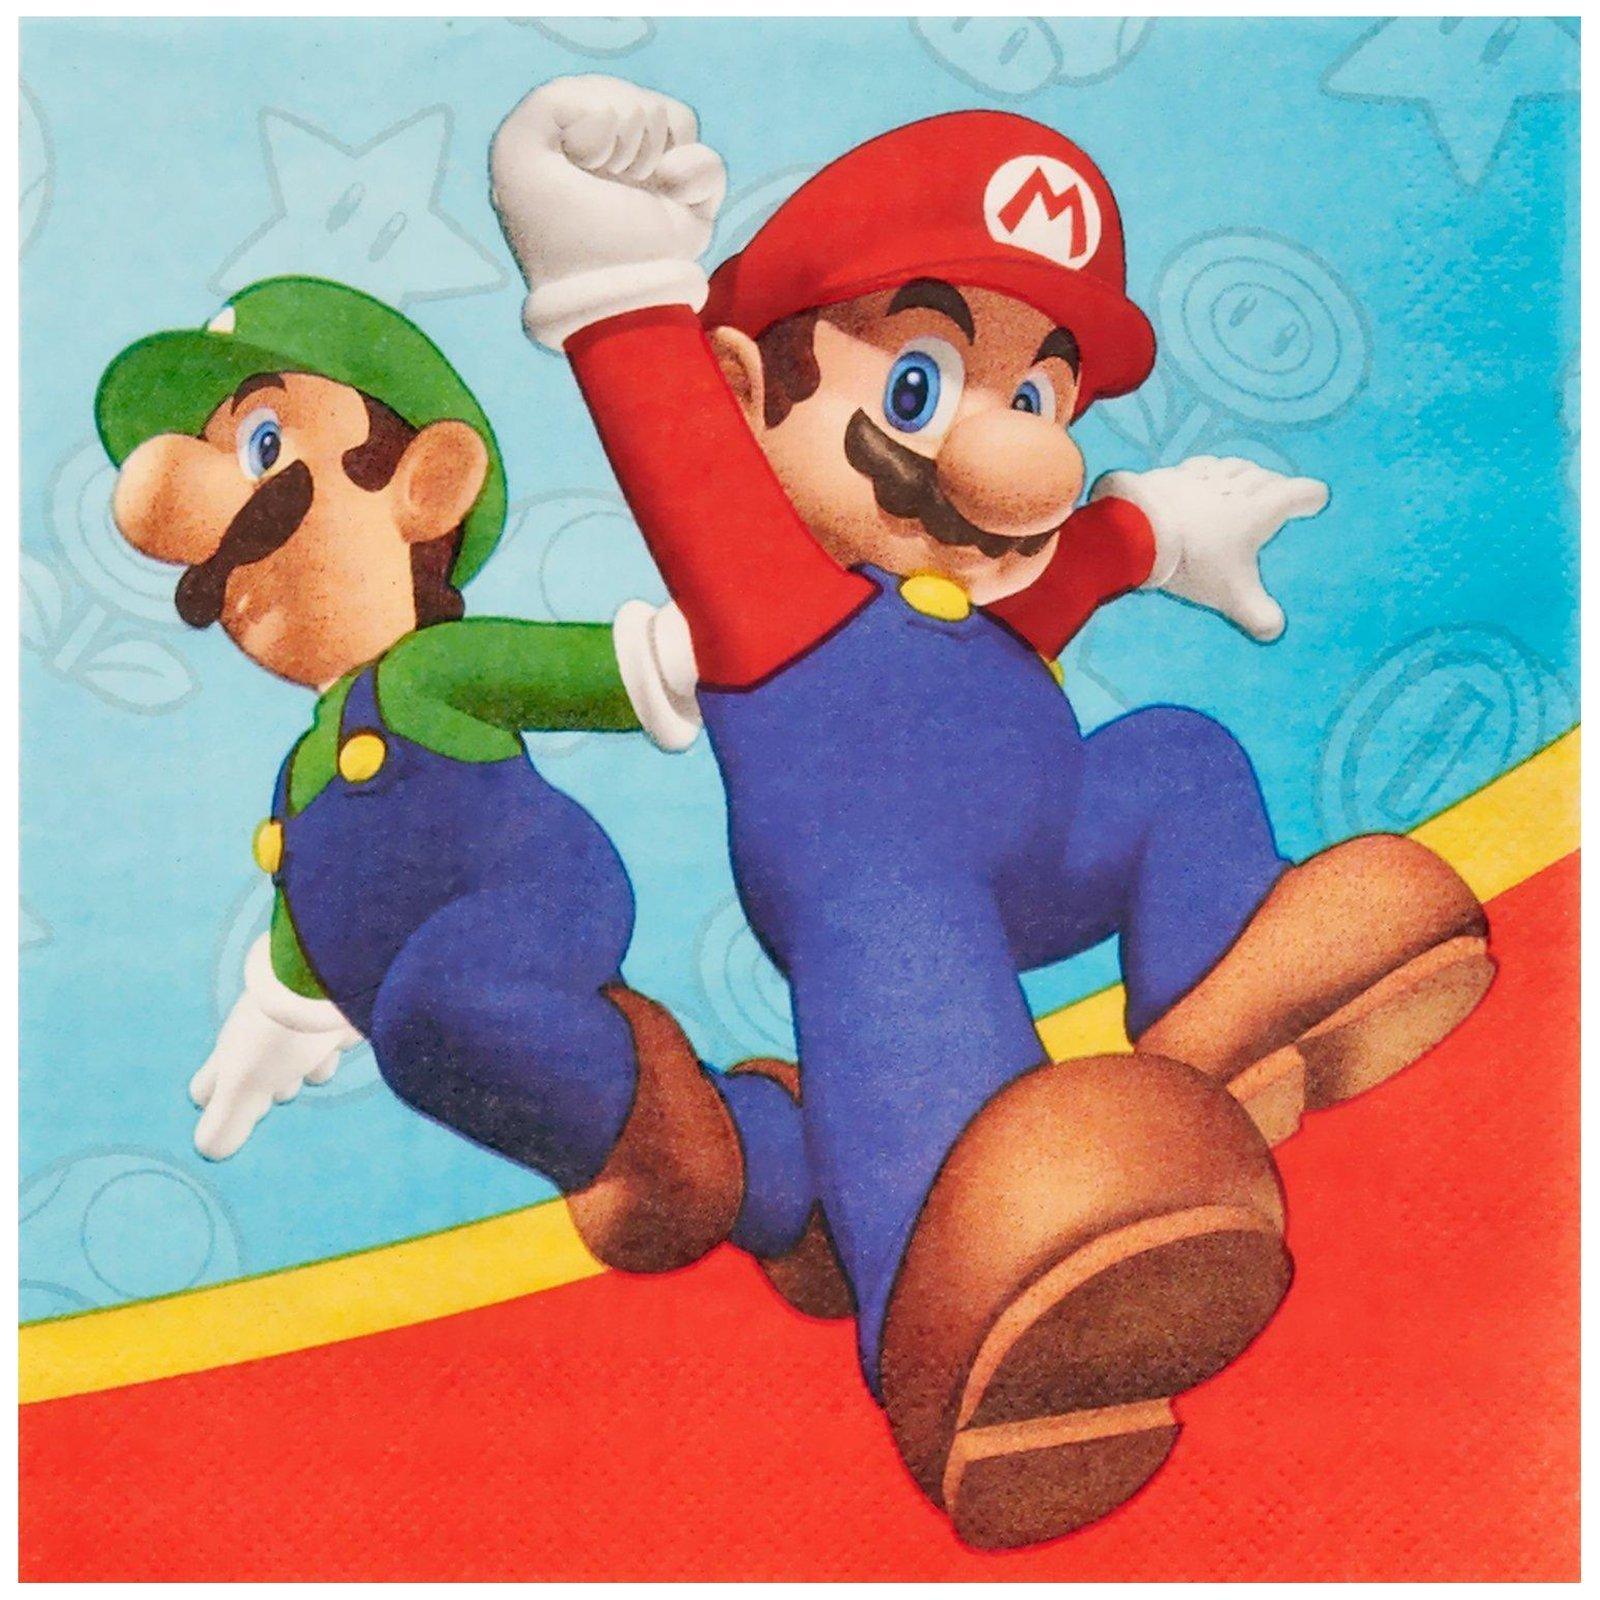 Super Mario Party Supplies - Lunch Napkins (20)